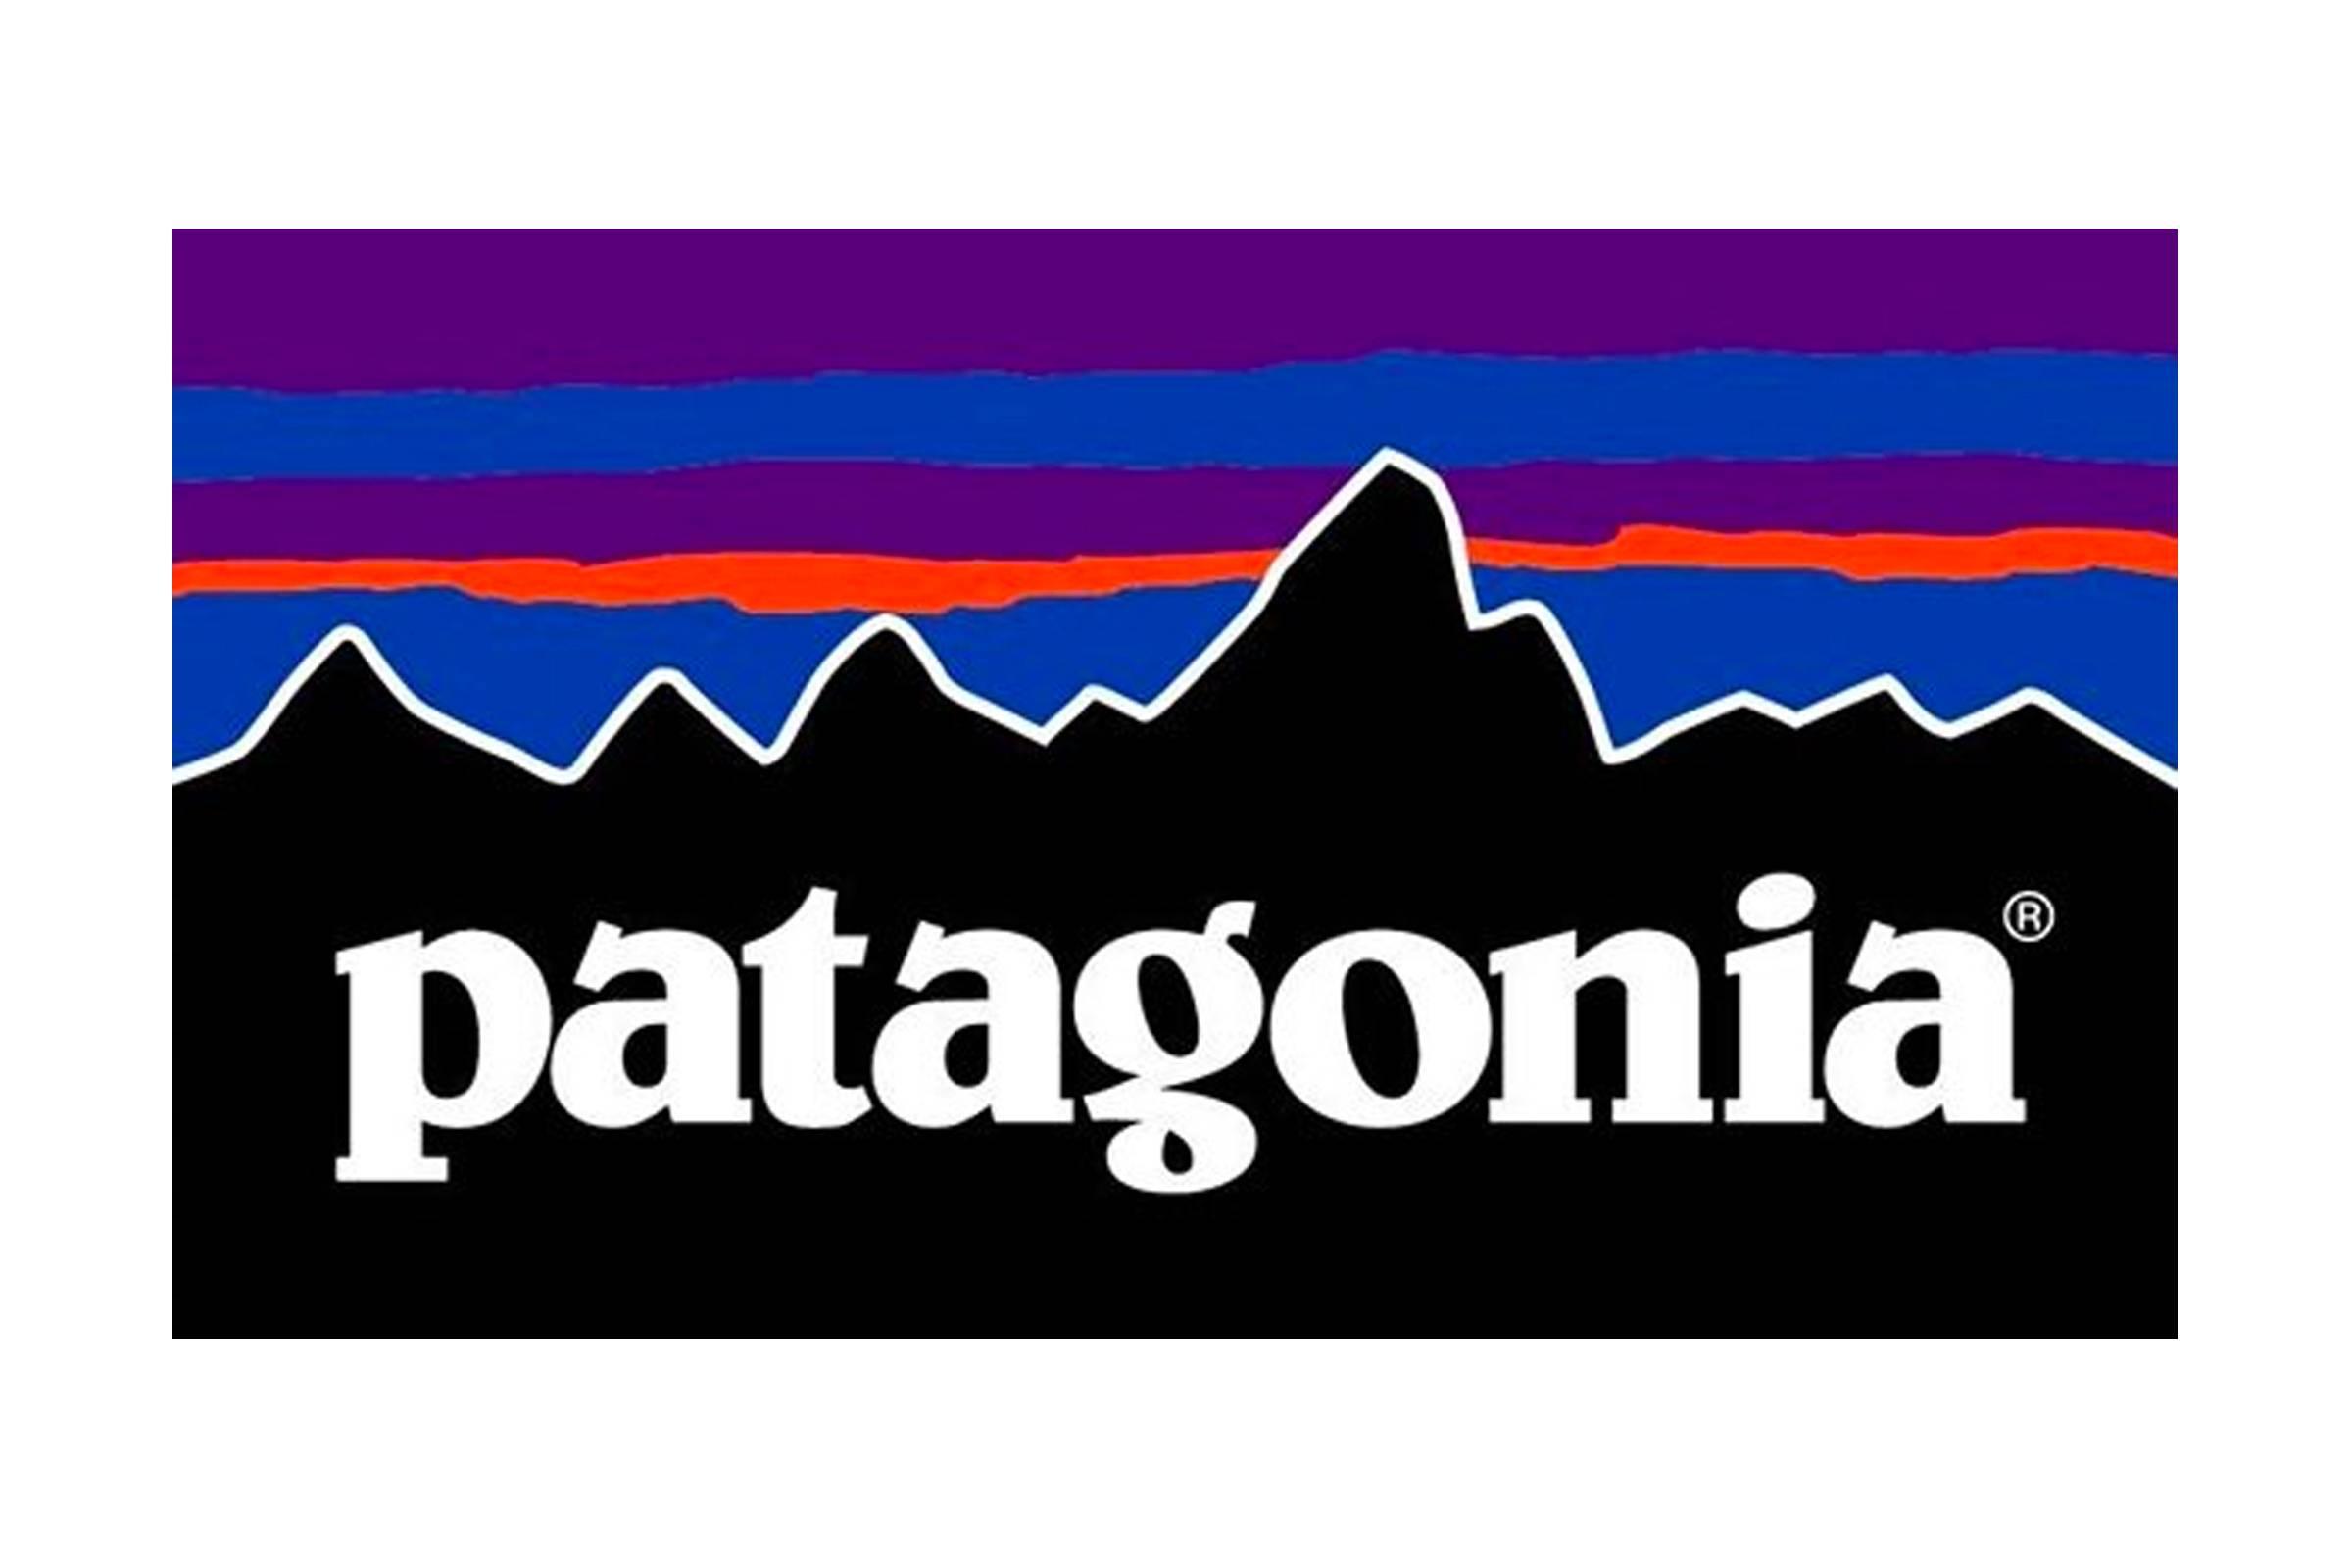 11. Patagonia